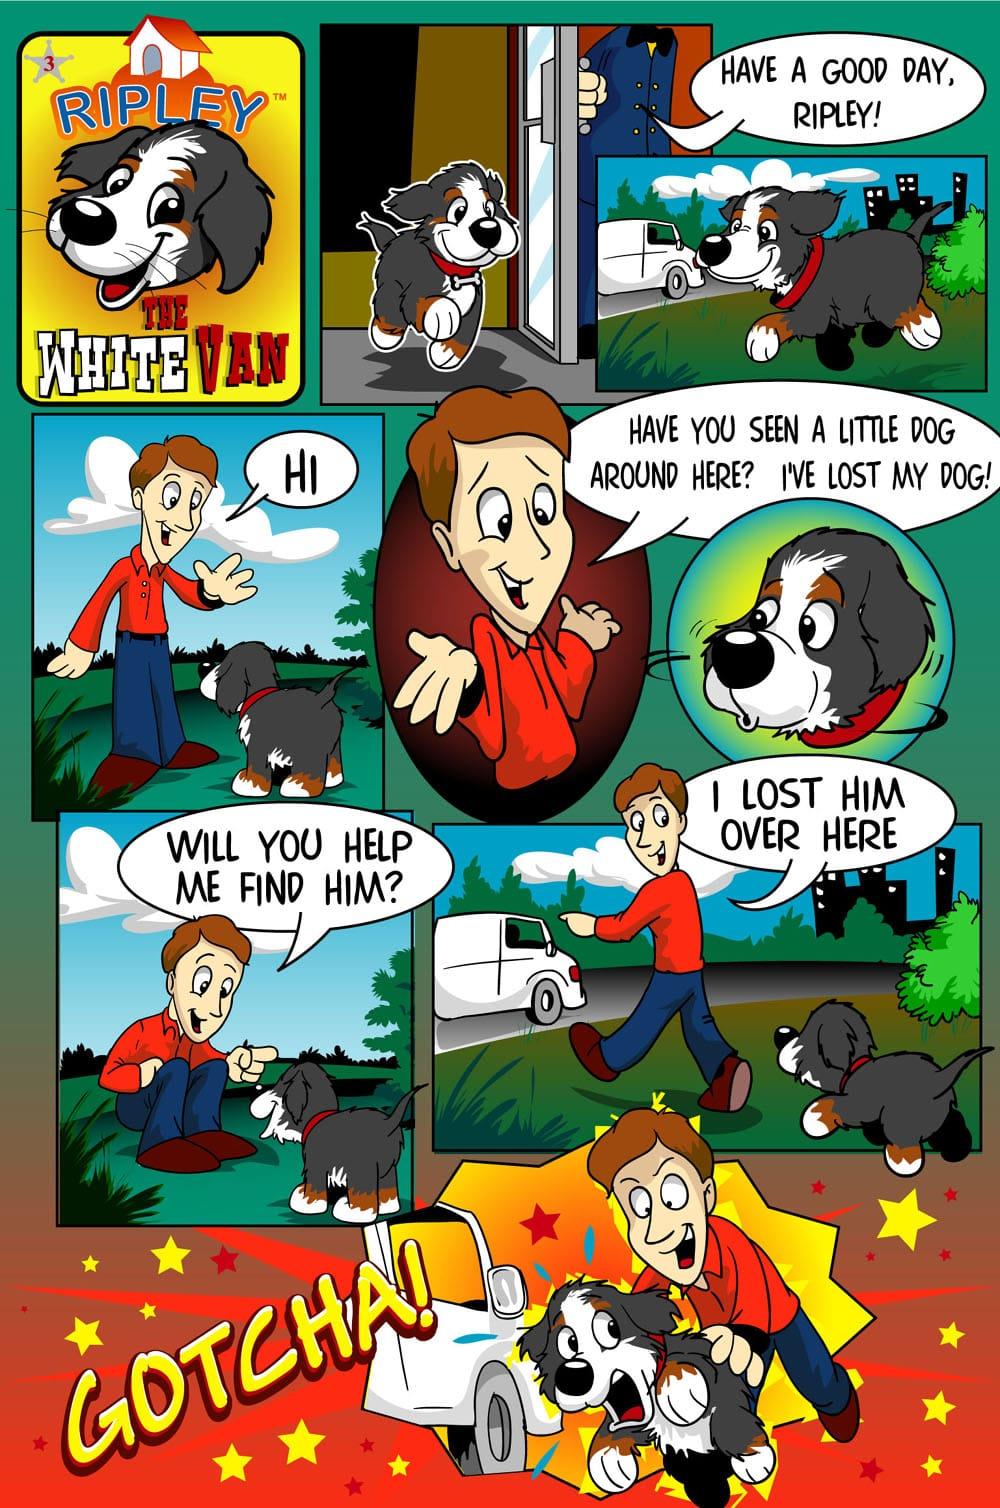 the white van ripley's comic page 1